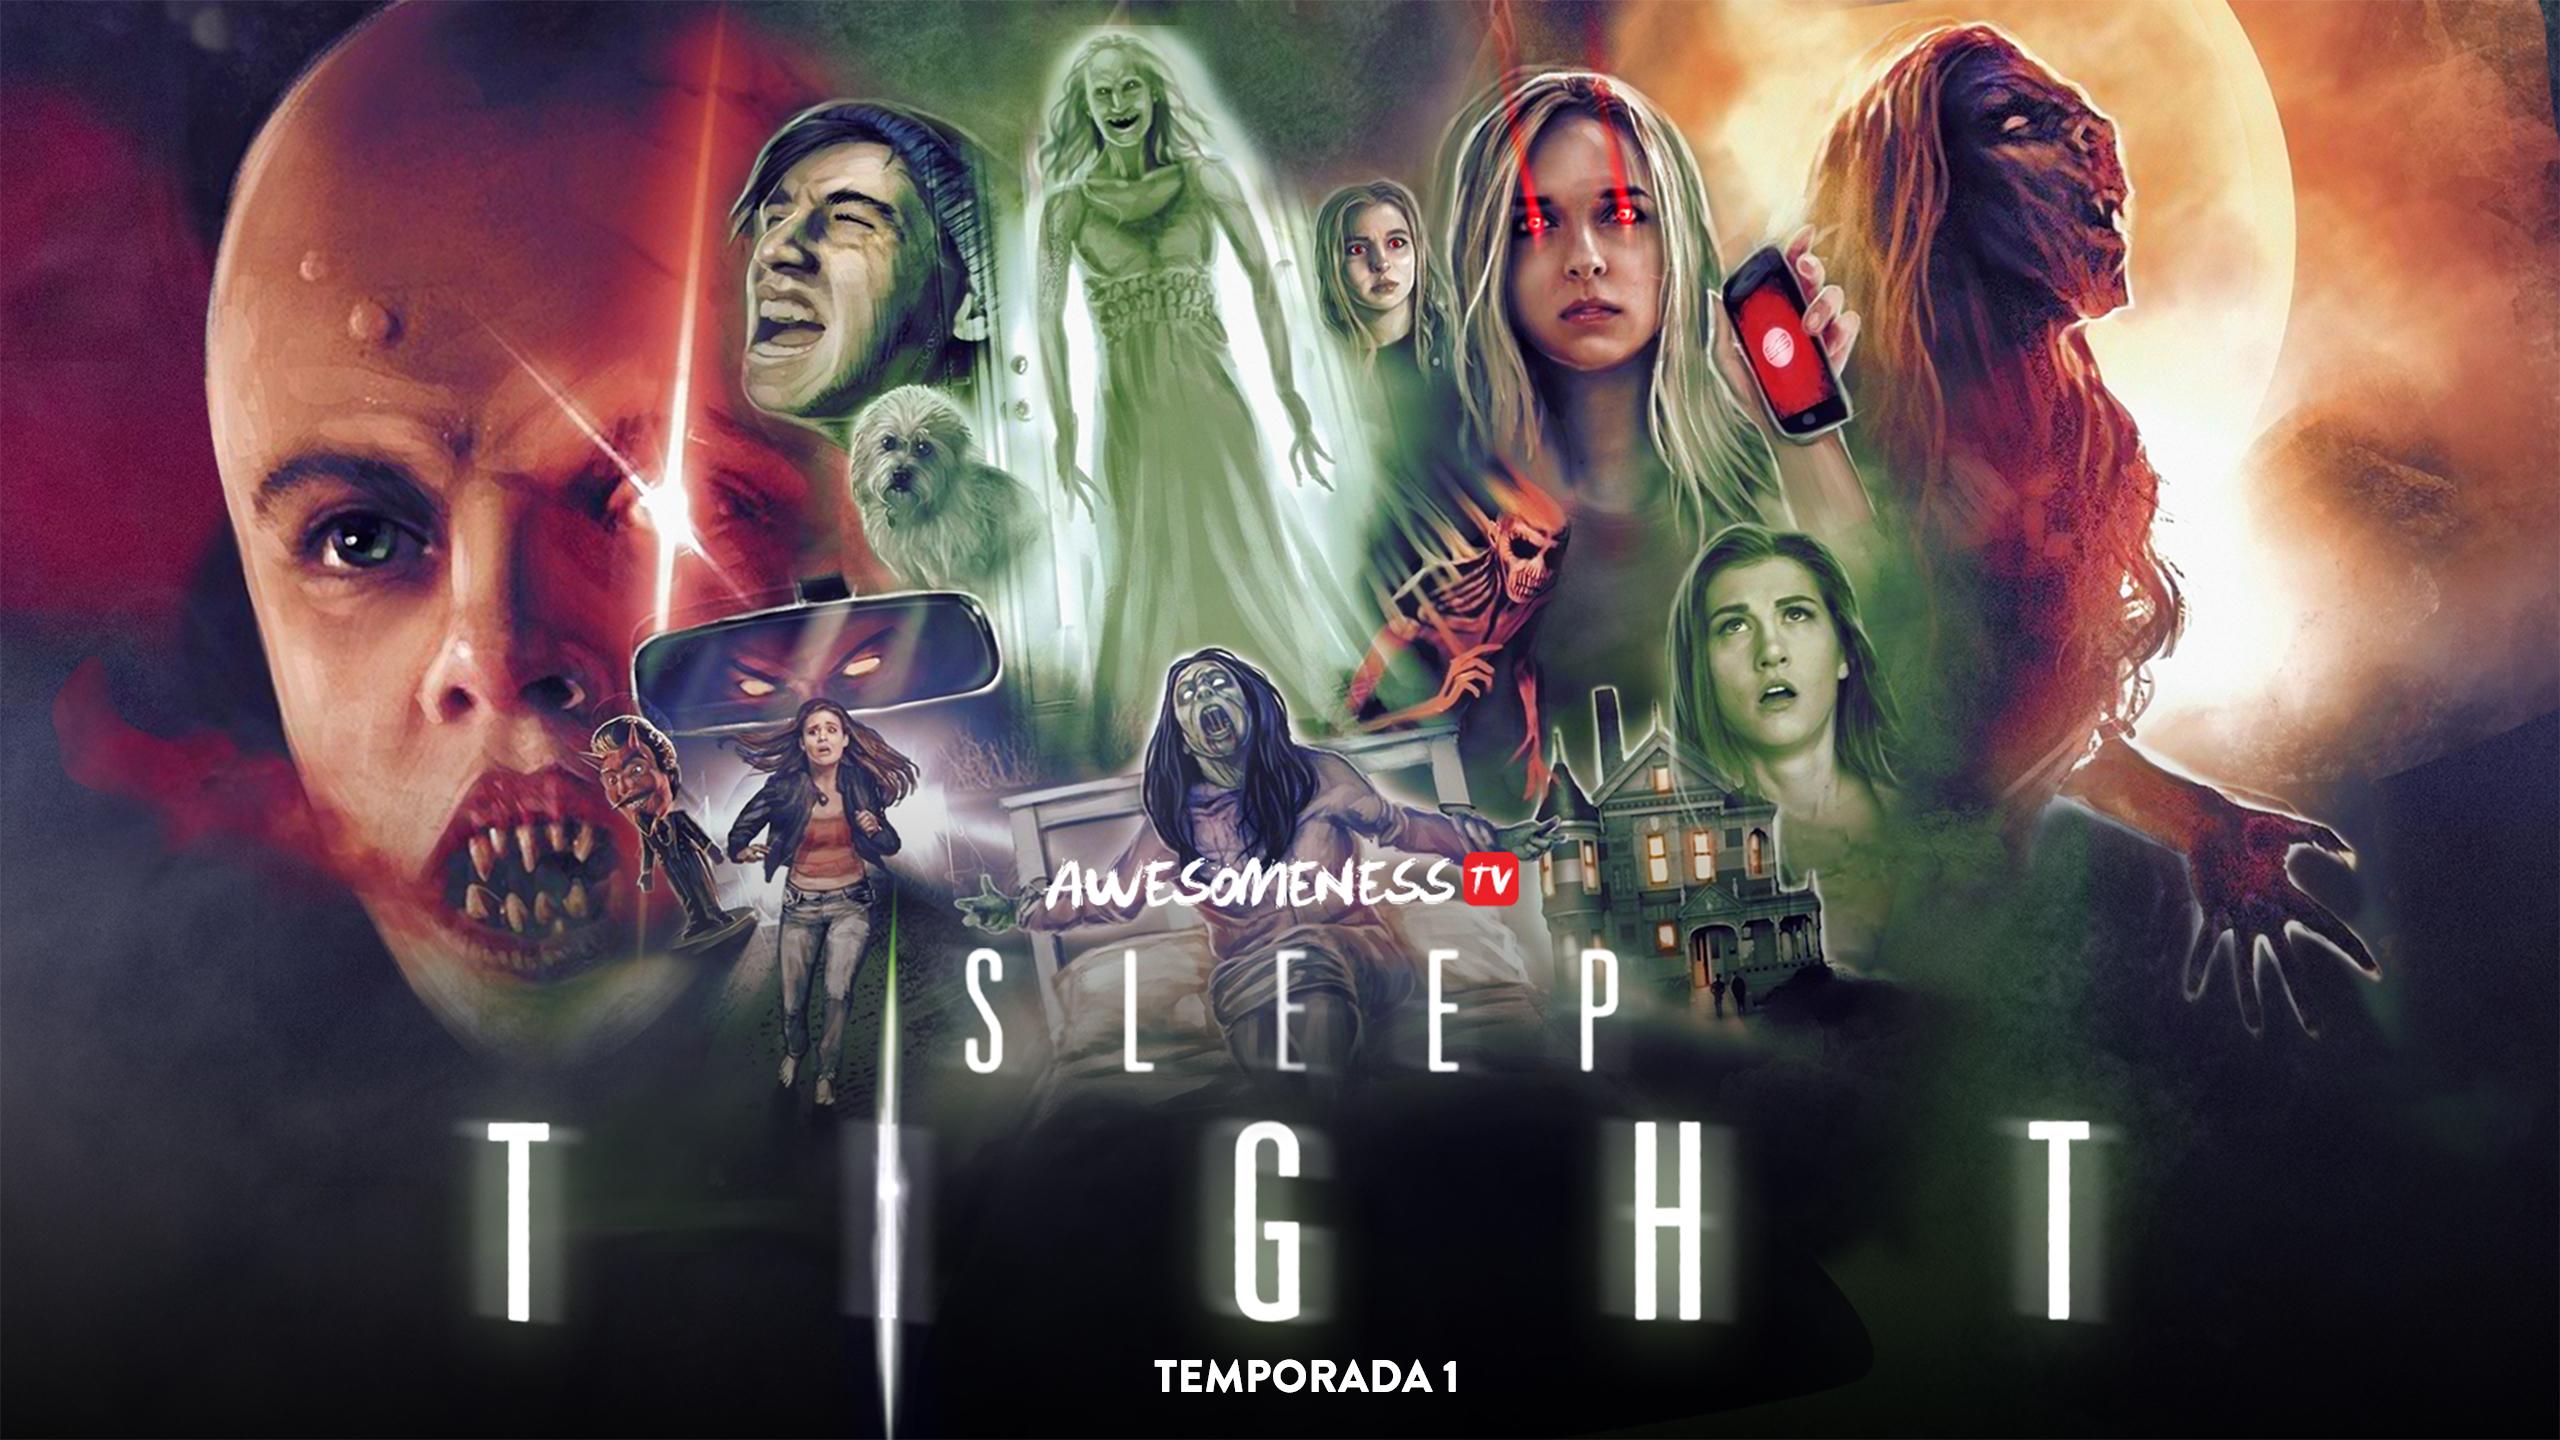 Watch Brasil | Disponibiliza conteúdos exclusivos da Awesomeness TV para o Halloween